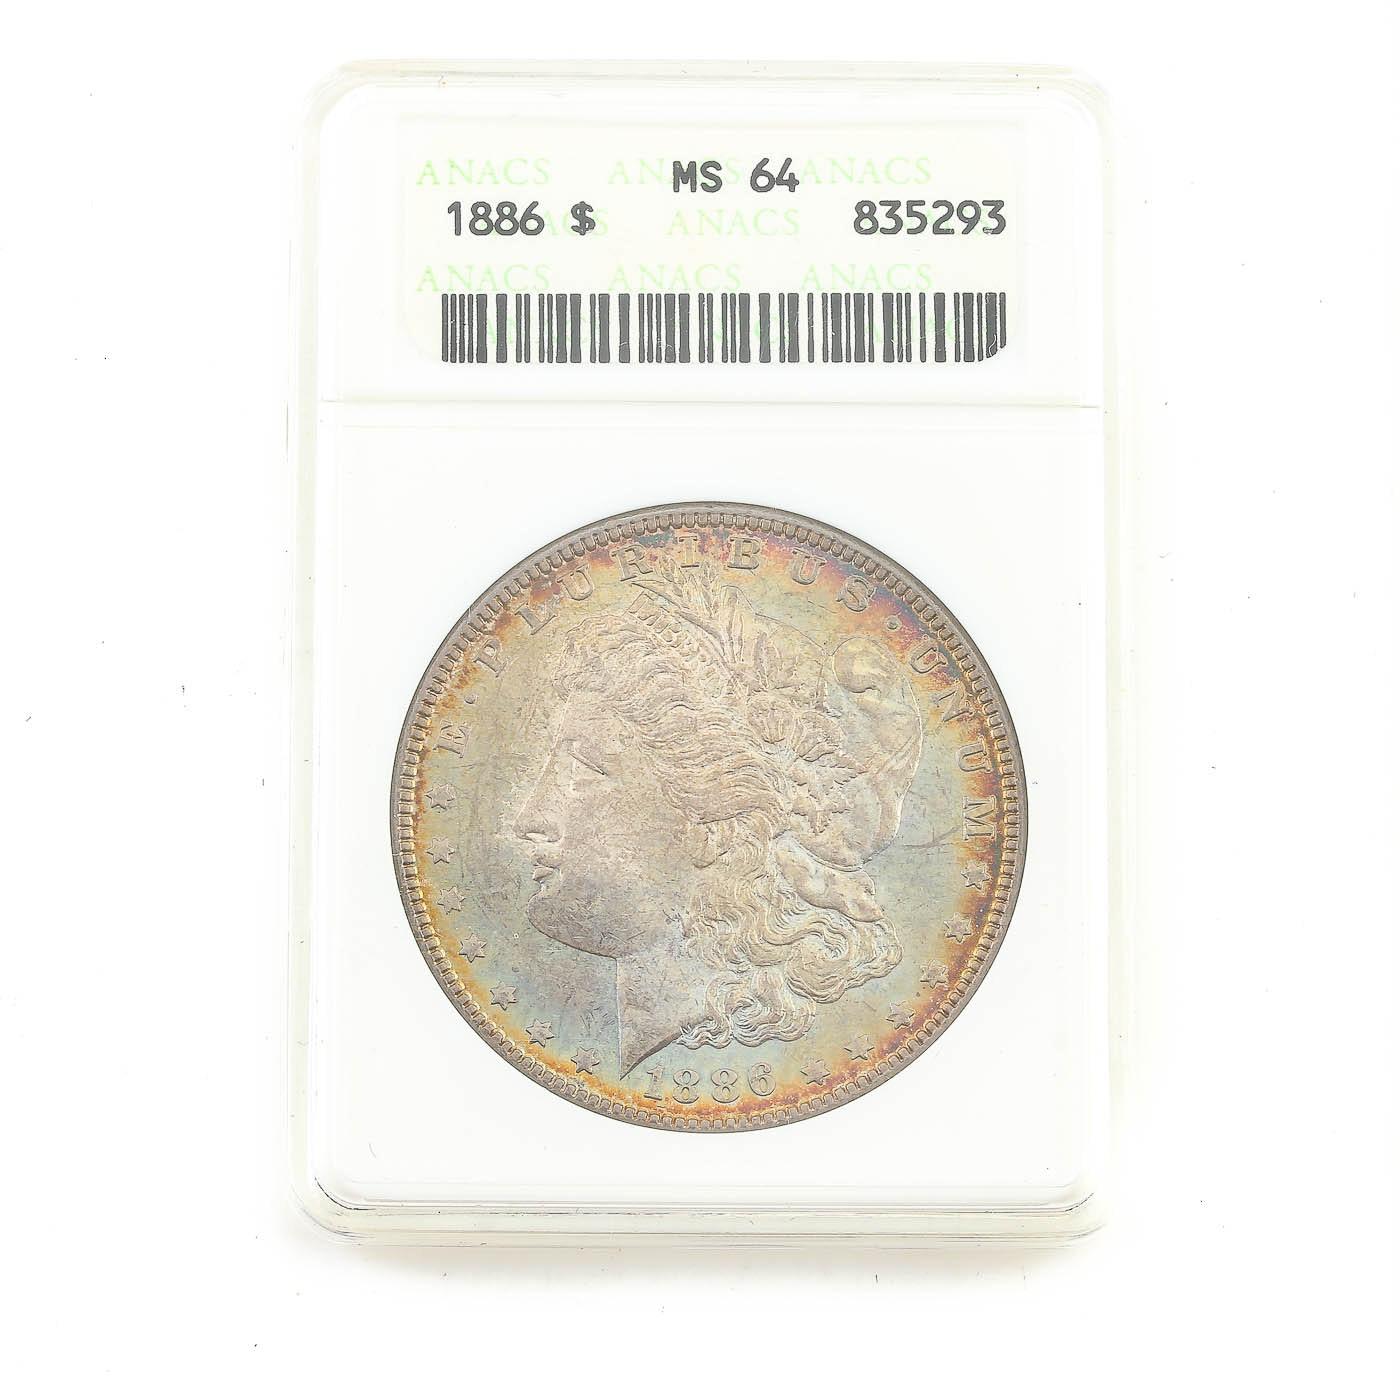 ANACS graded MS64 1886 Morgan Silver Dollar